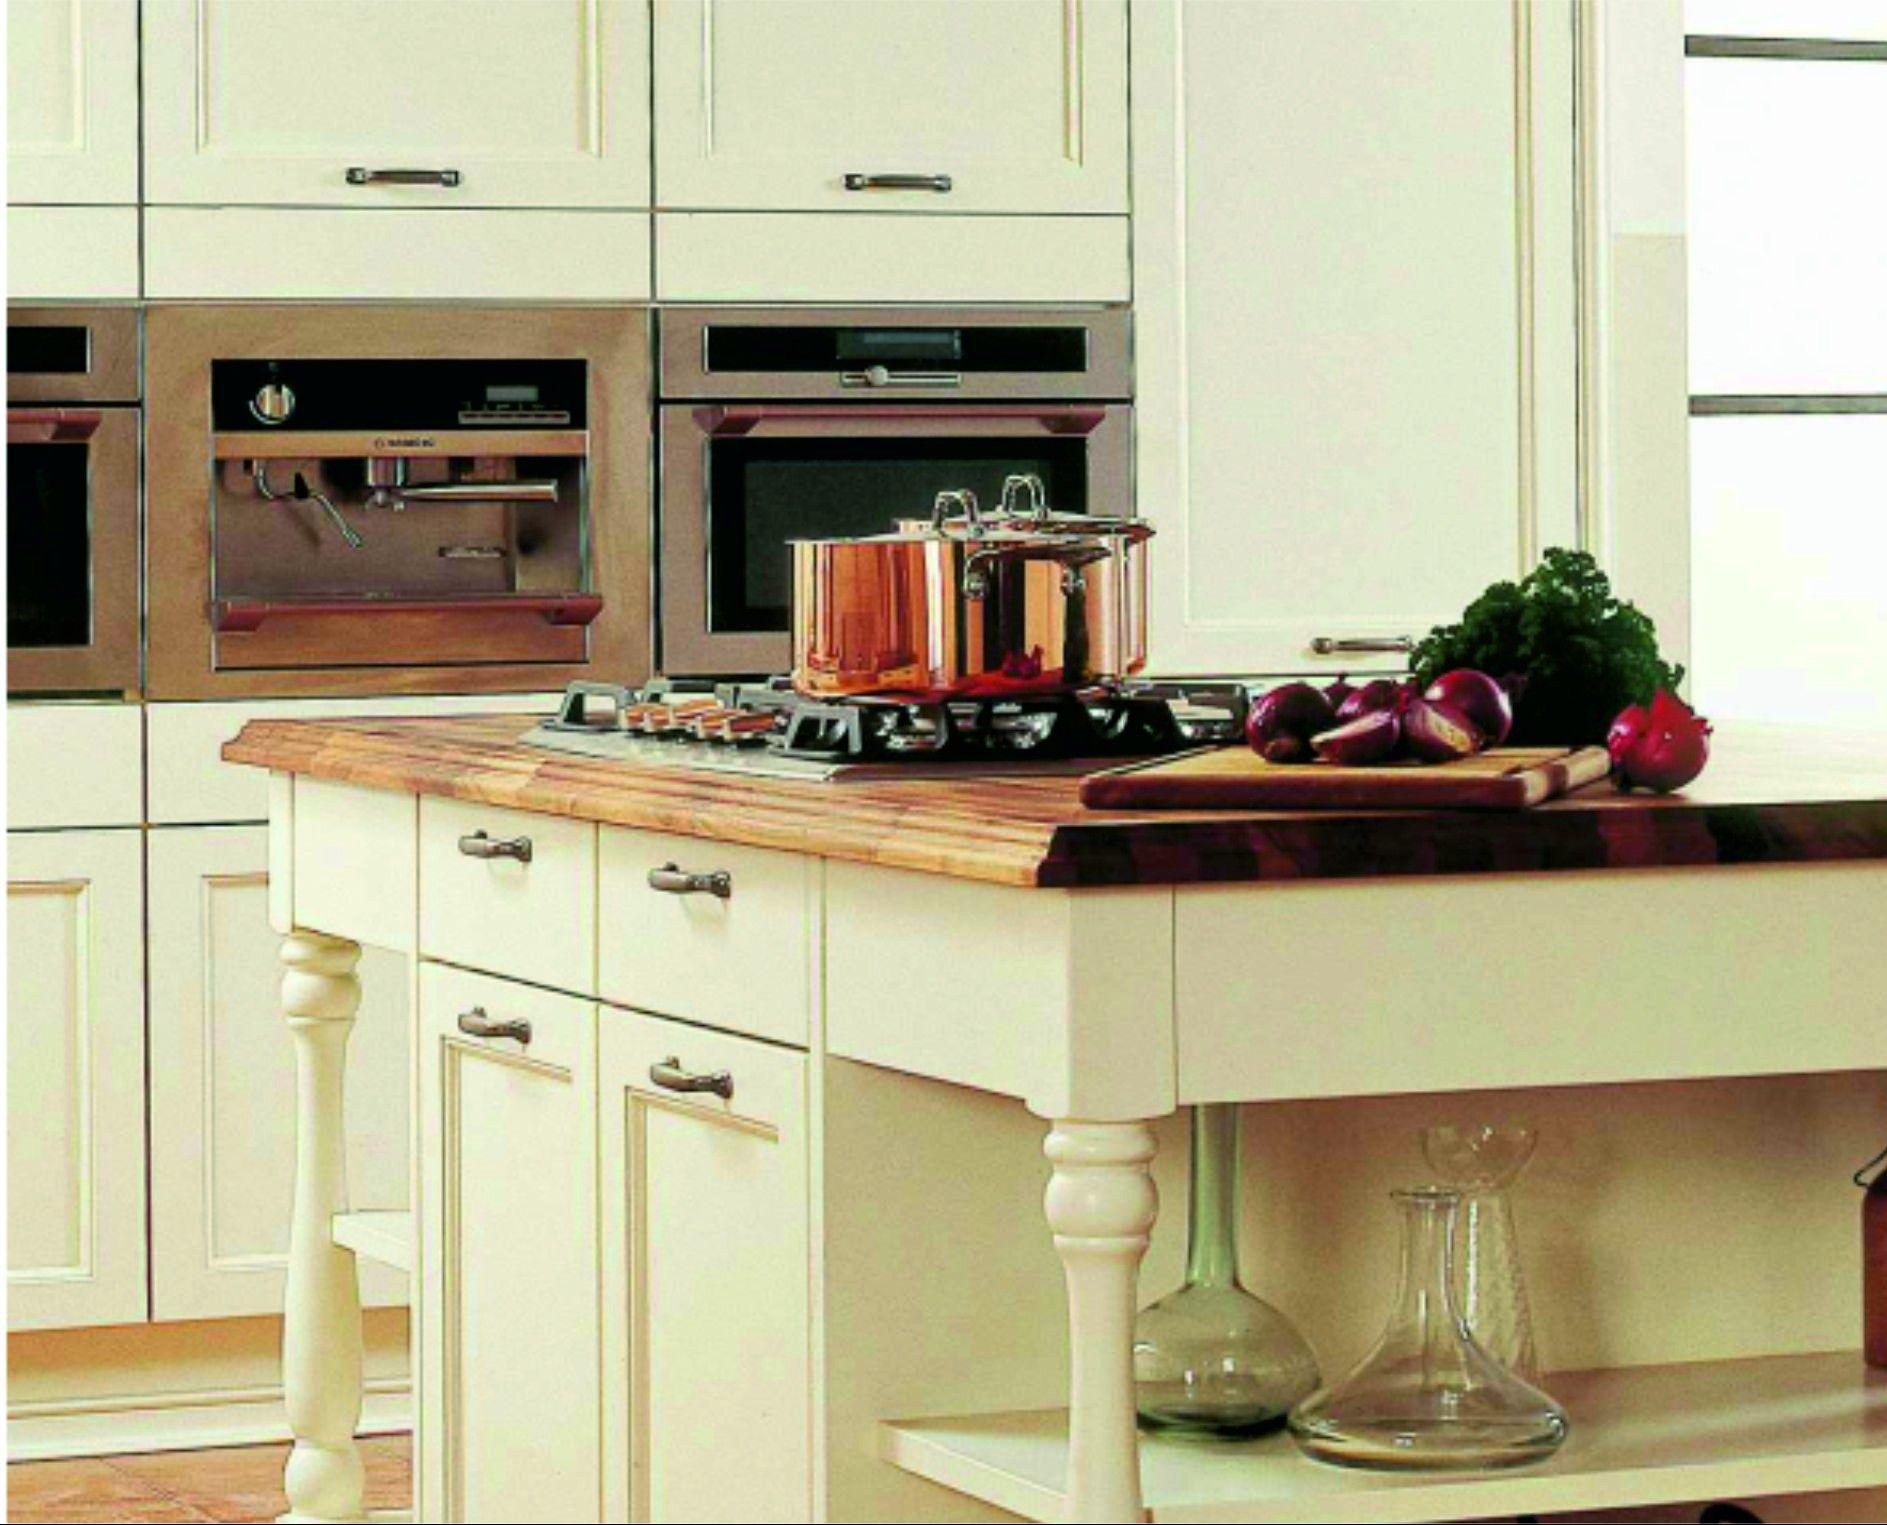 Landelijke Keuken Ikea : Landelijke keukens